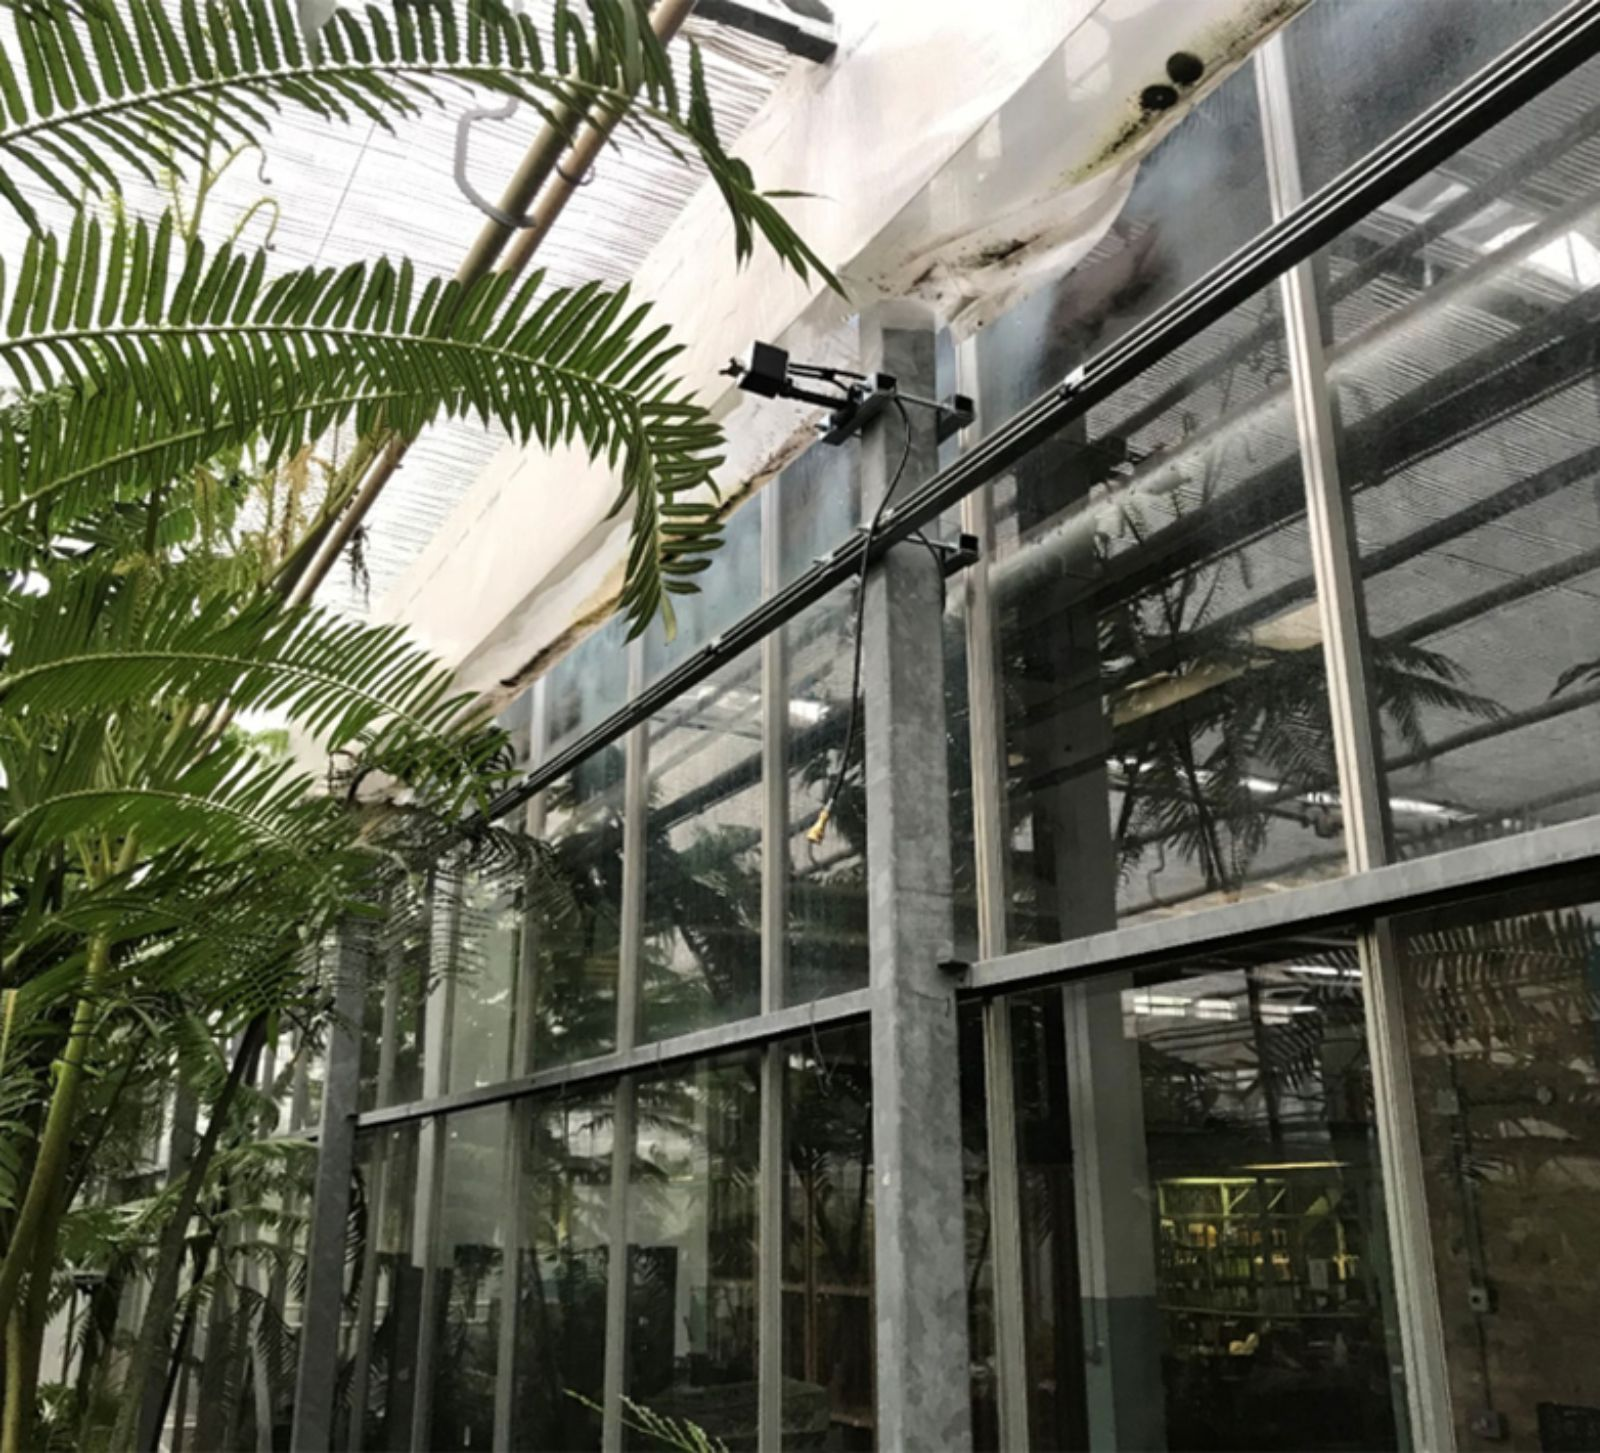 Kew gardens fogging system